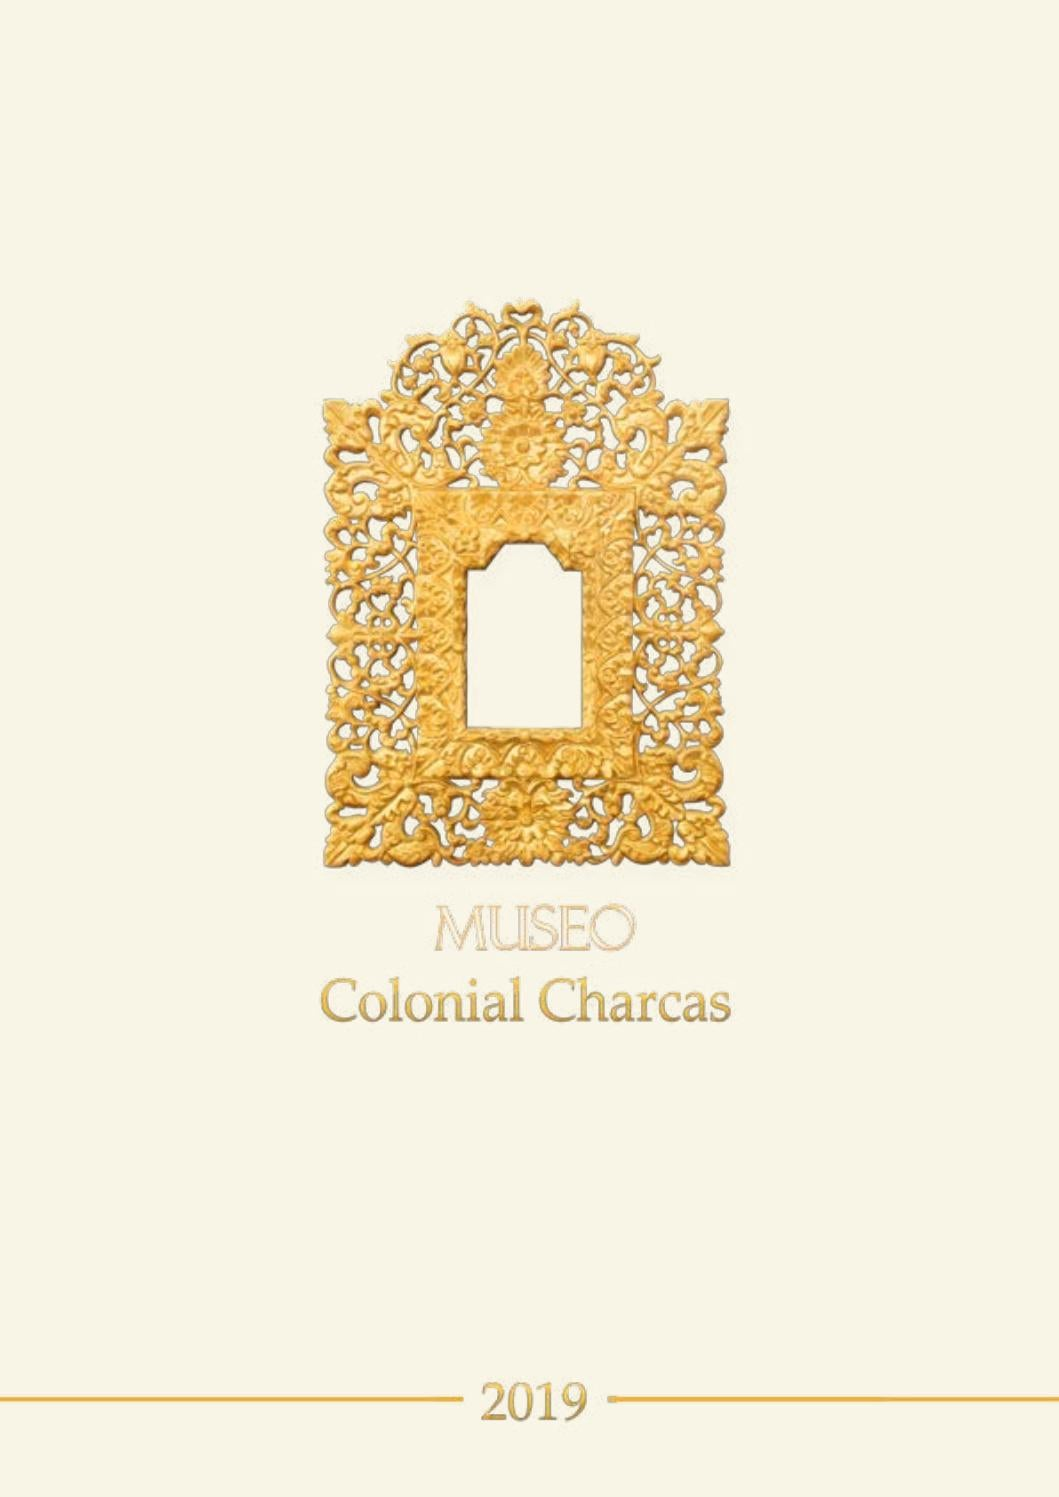 Aureolas Gigantes museo colonial charcas 2019aecid publicaciones - issuu